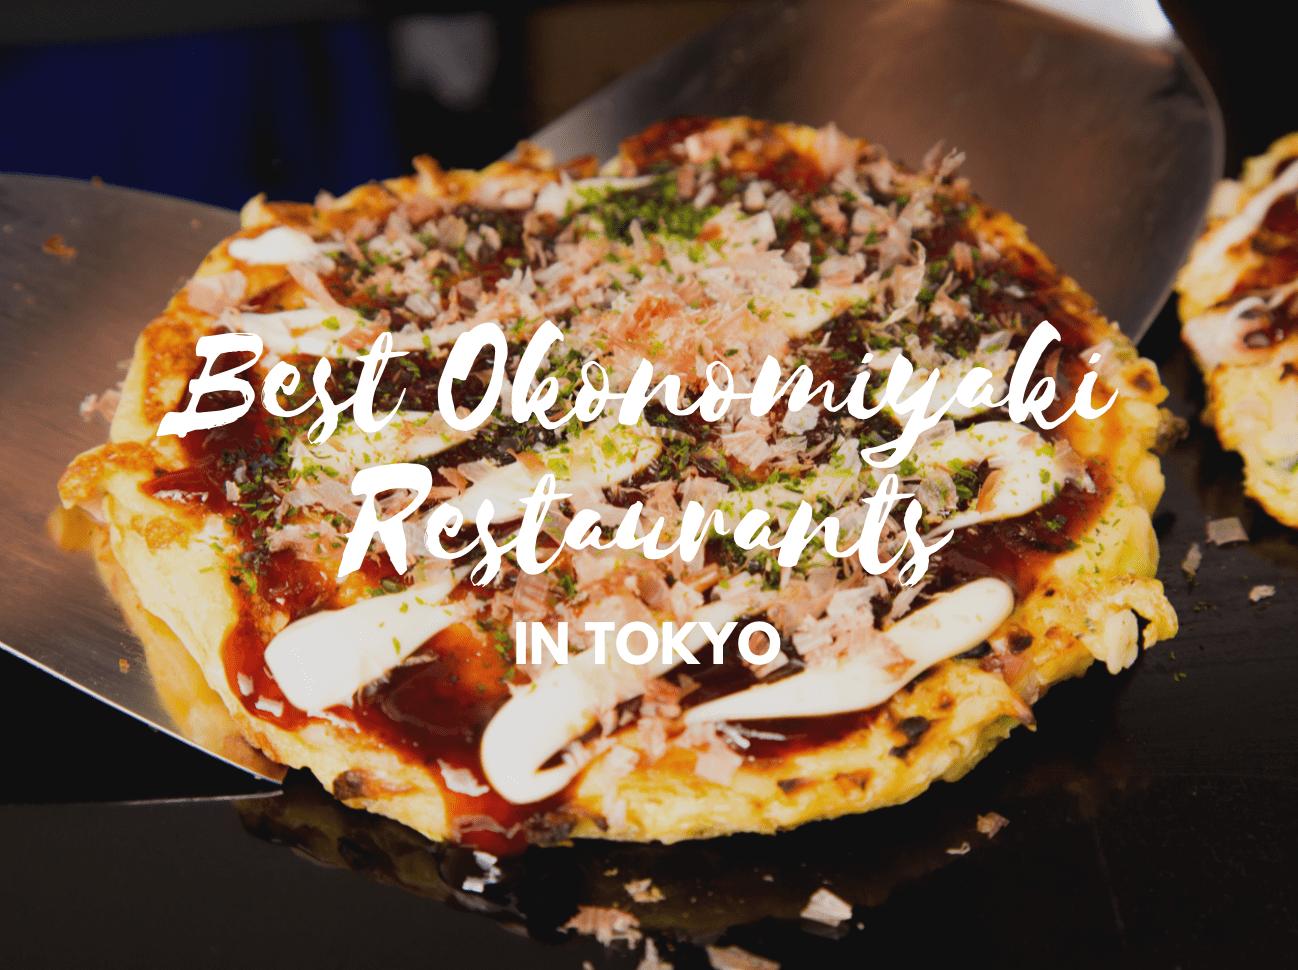 Best Okonomiyaki Restaurants in Tokyo